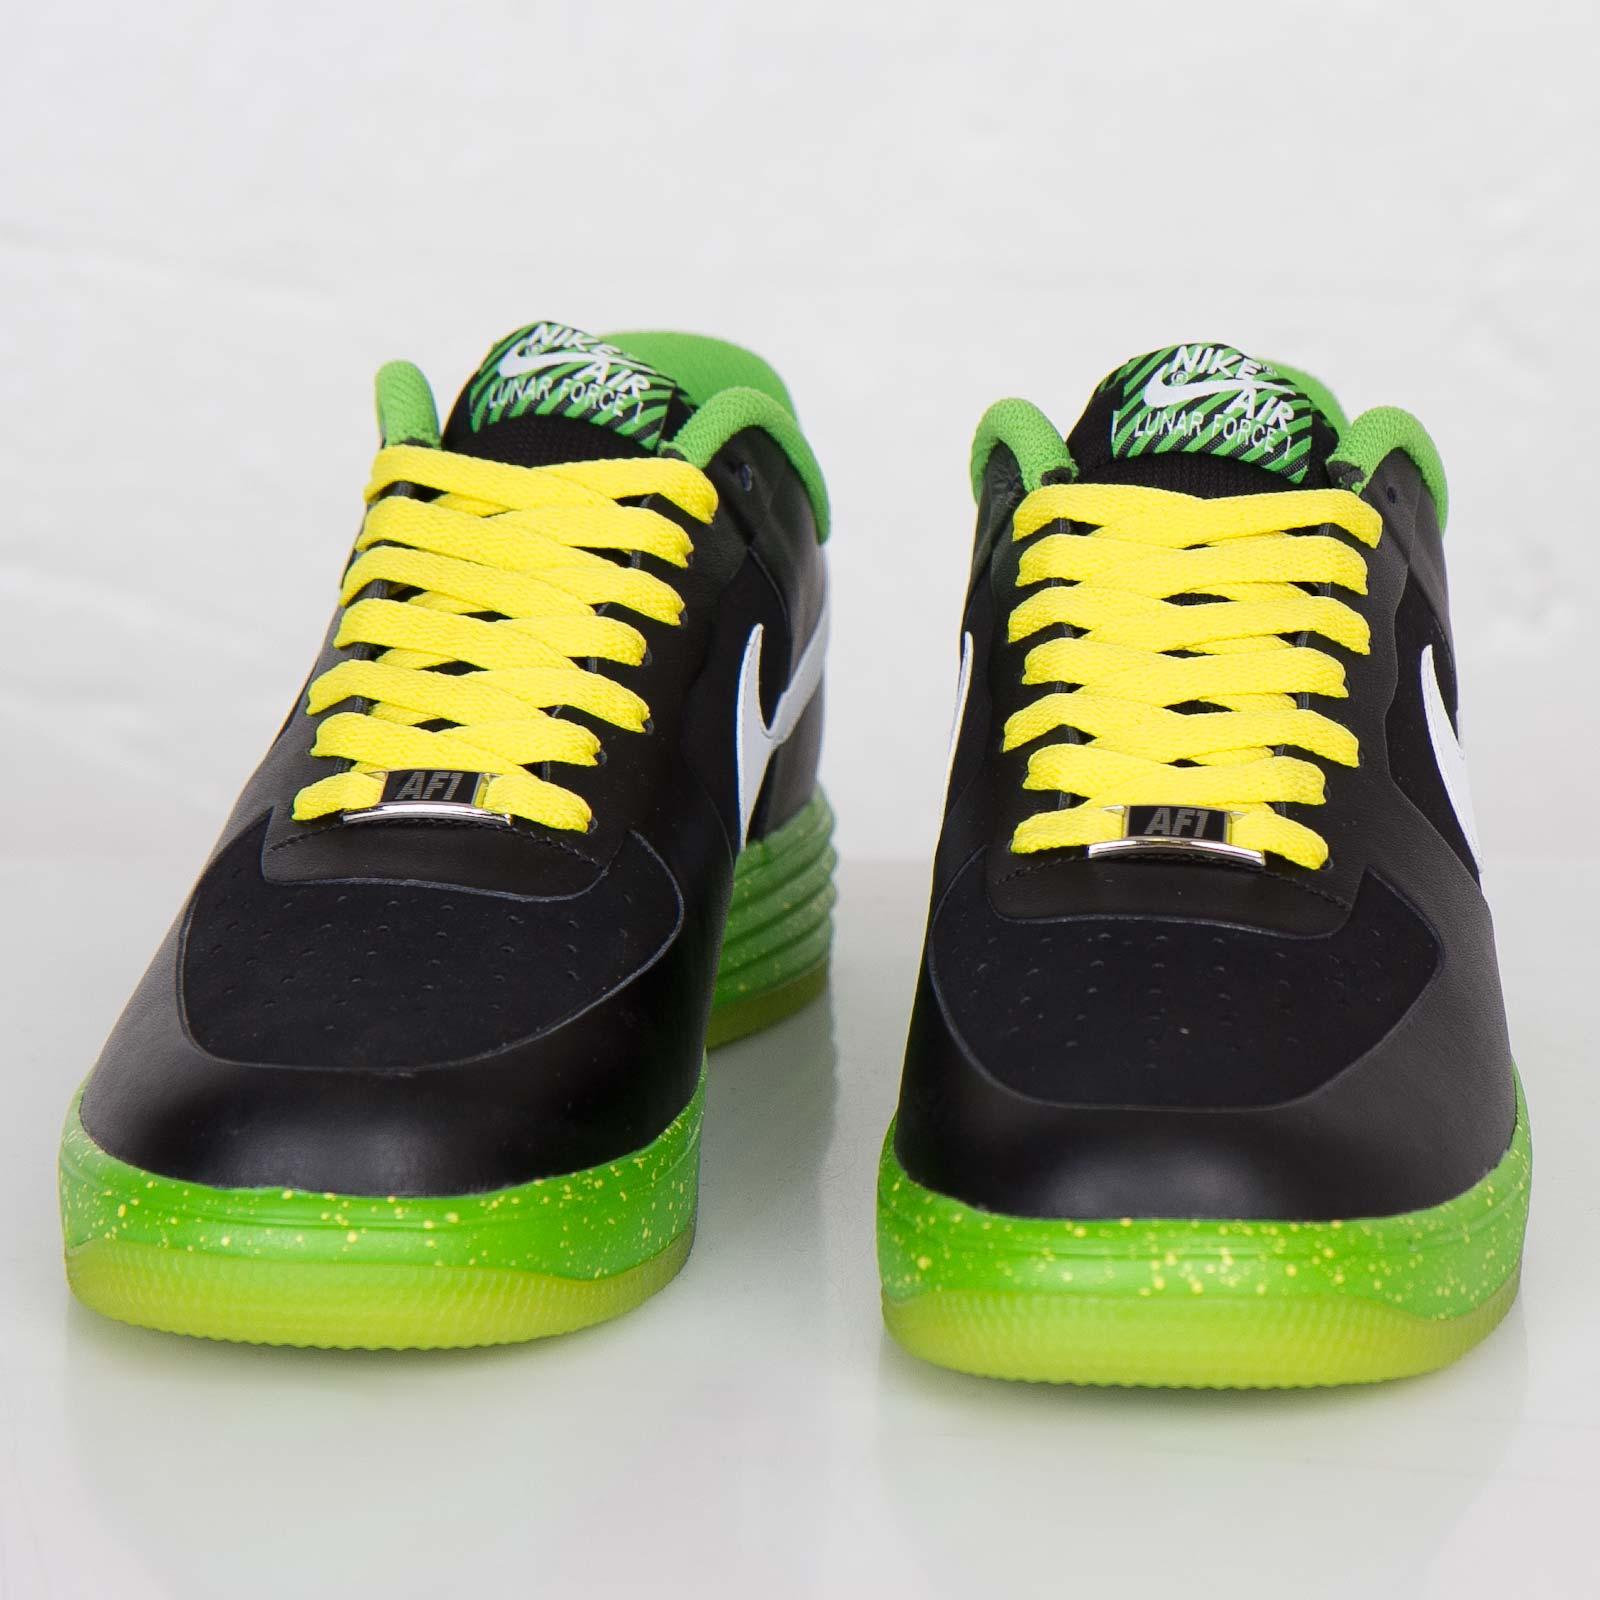 separation shoes 39187 f2b69 Nike Lunar Force 1 NS Premium - 629970-001 - Sneakersnstuff | sneakers &  streetwear online since 1999